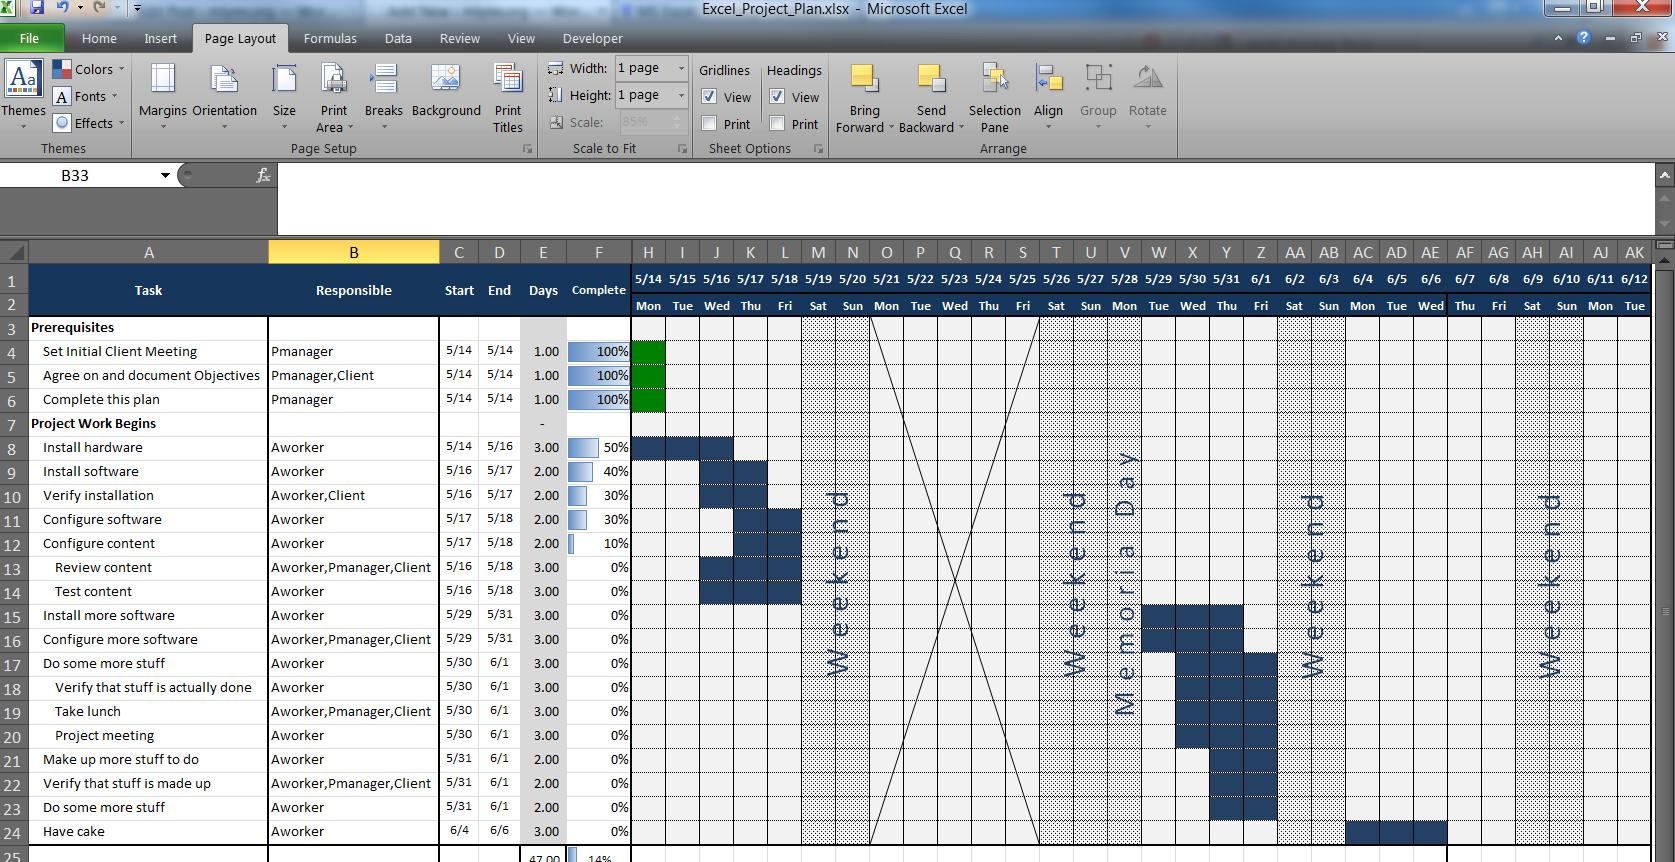 Template Excel Gratis Task Tracking Spreadsheet Template Tracking Spreadsheet Spreadsheet Templates for Busines Tracking Spreadsheet Spreadsheet Templates for Busines Project Schedule Excel Template Free Download